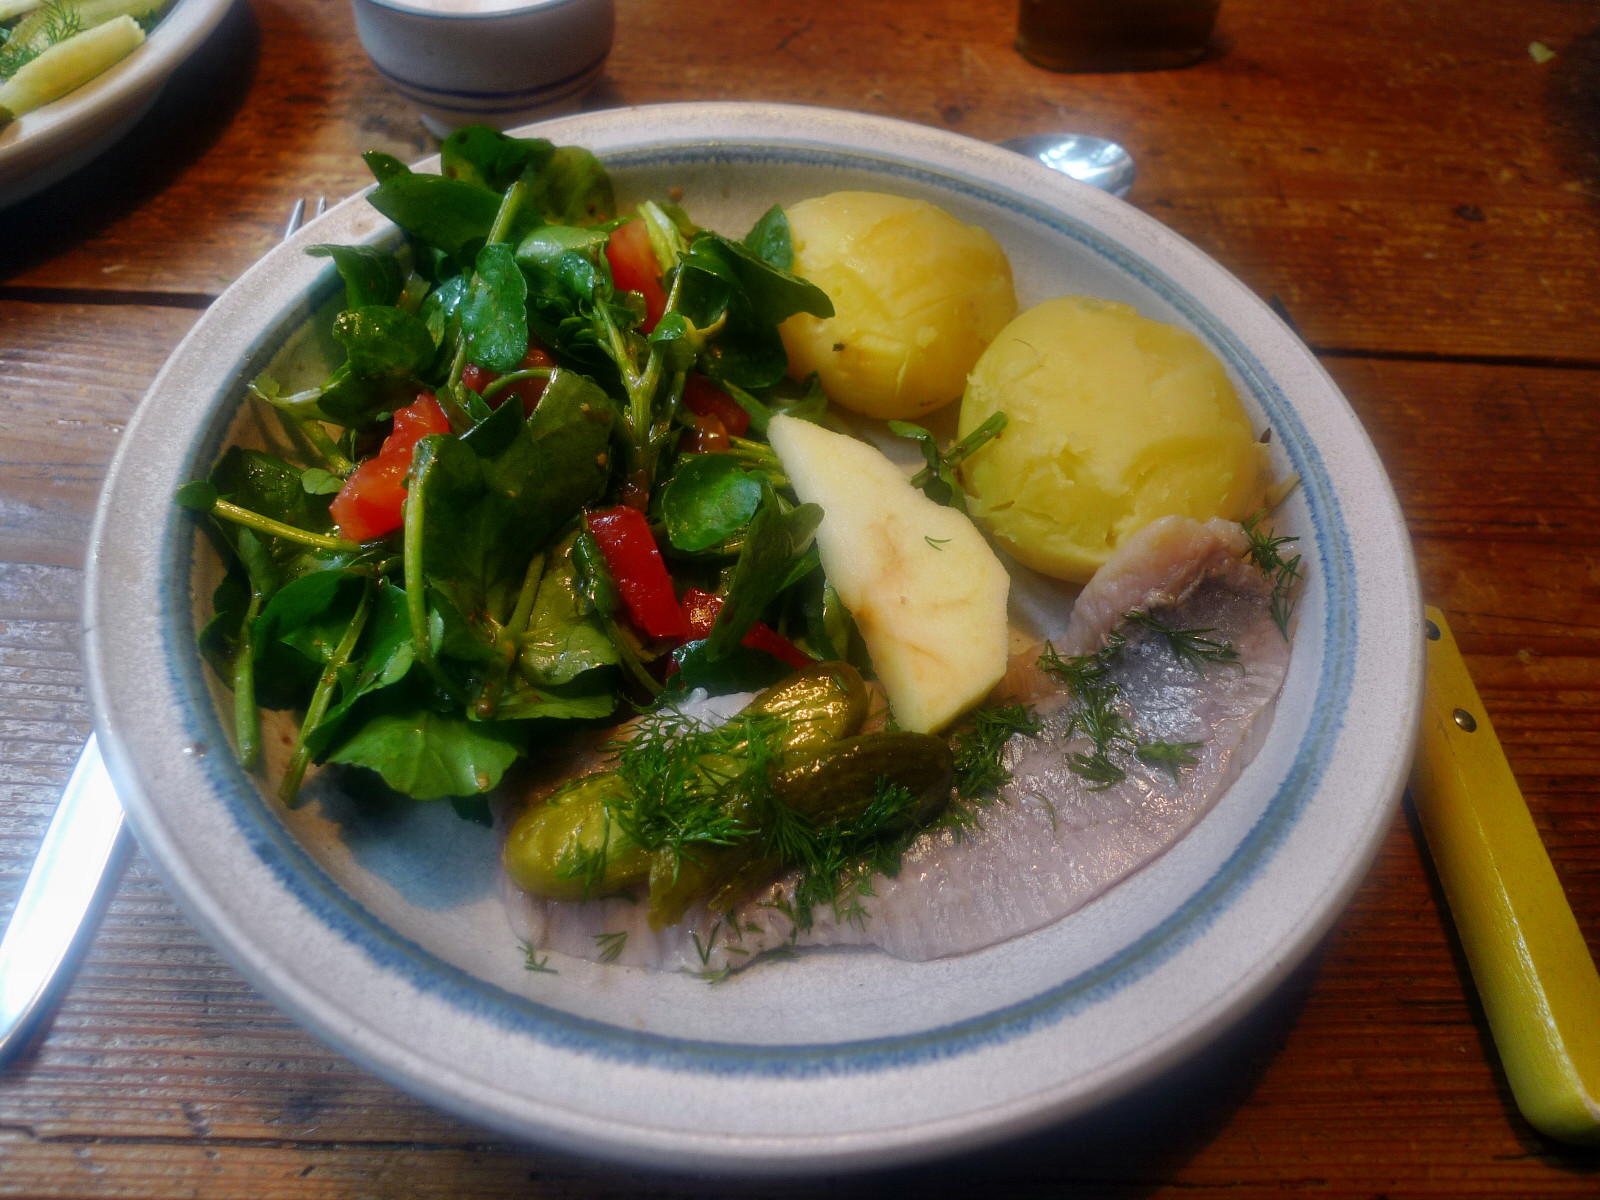 Matjes,Kressesalat,Feldsalat,Kartoffeln - 5.11.14   (5)